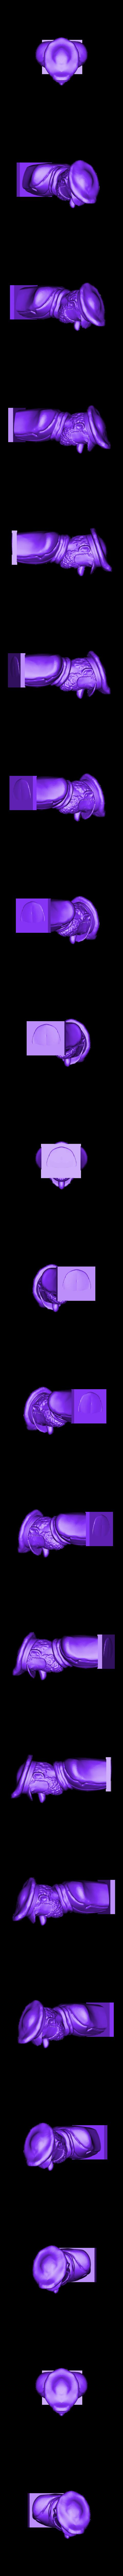 haddock.obj Download free OBJ file Captain Haddock • 3D printing model, MisterDiD